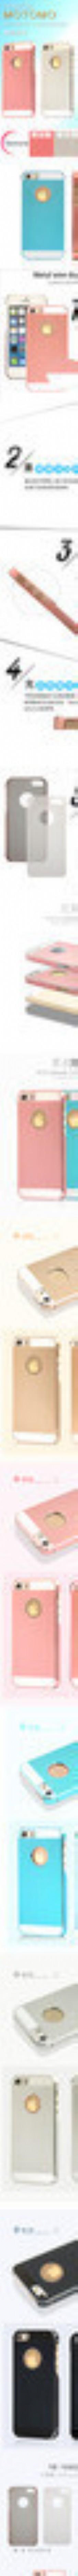 iPhone5手机壳图片